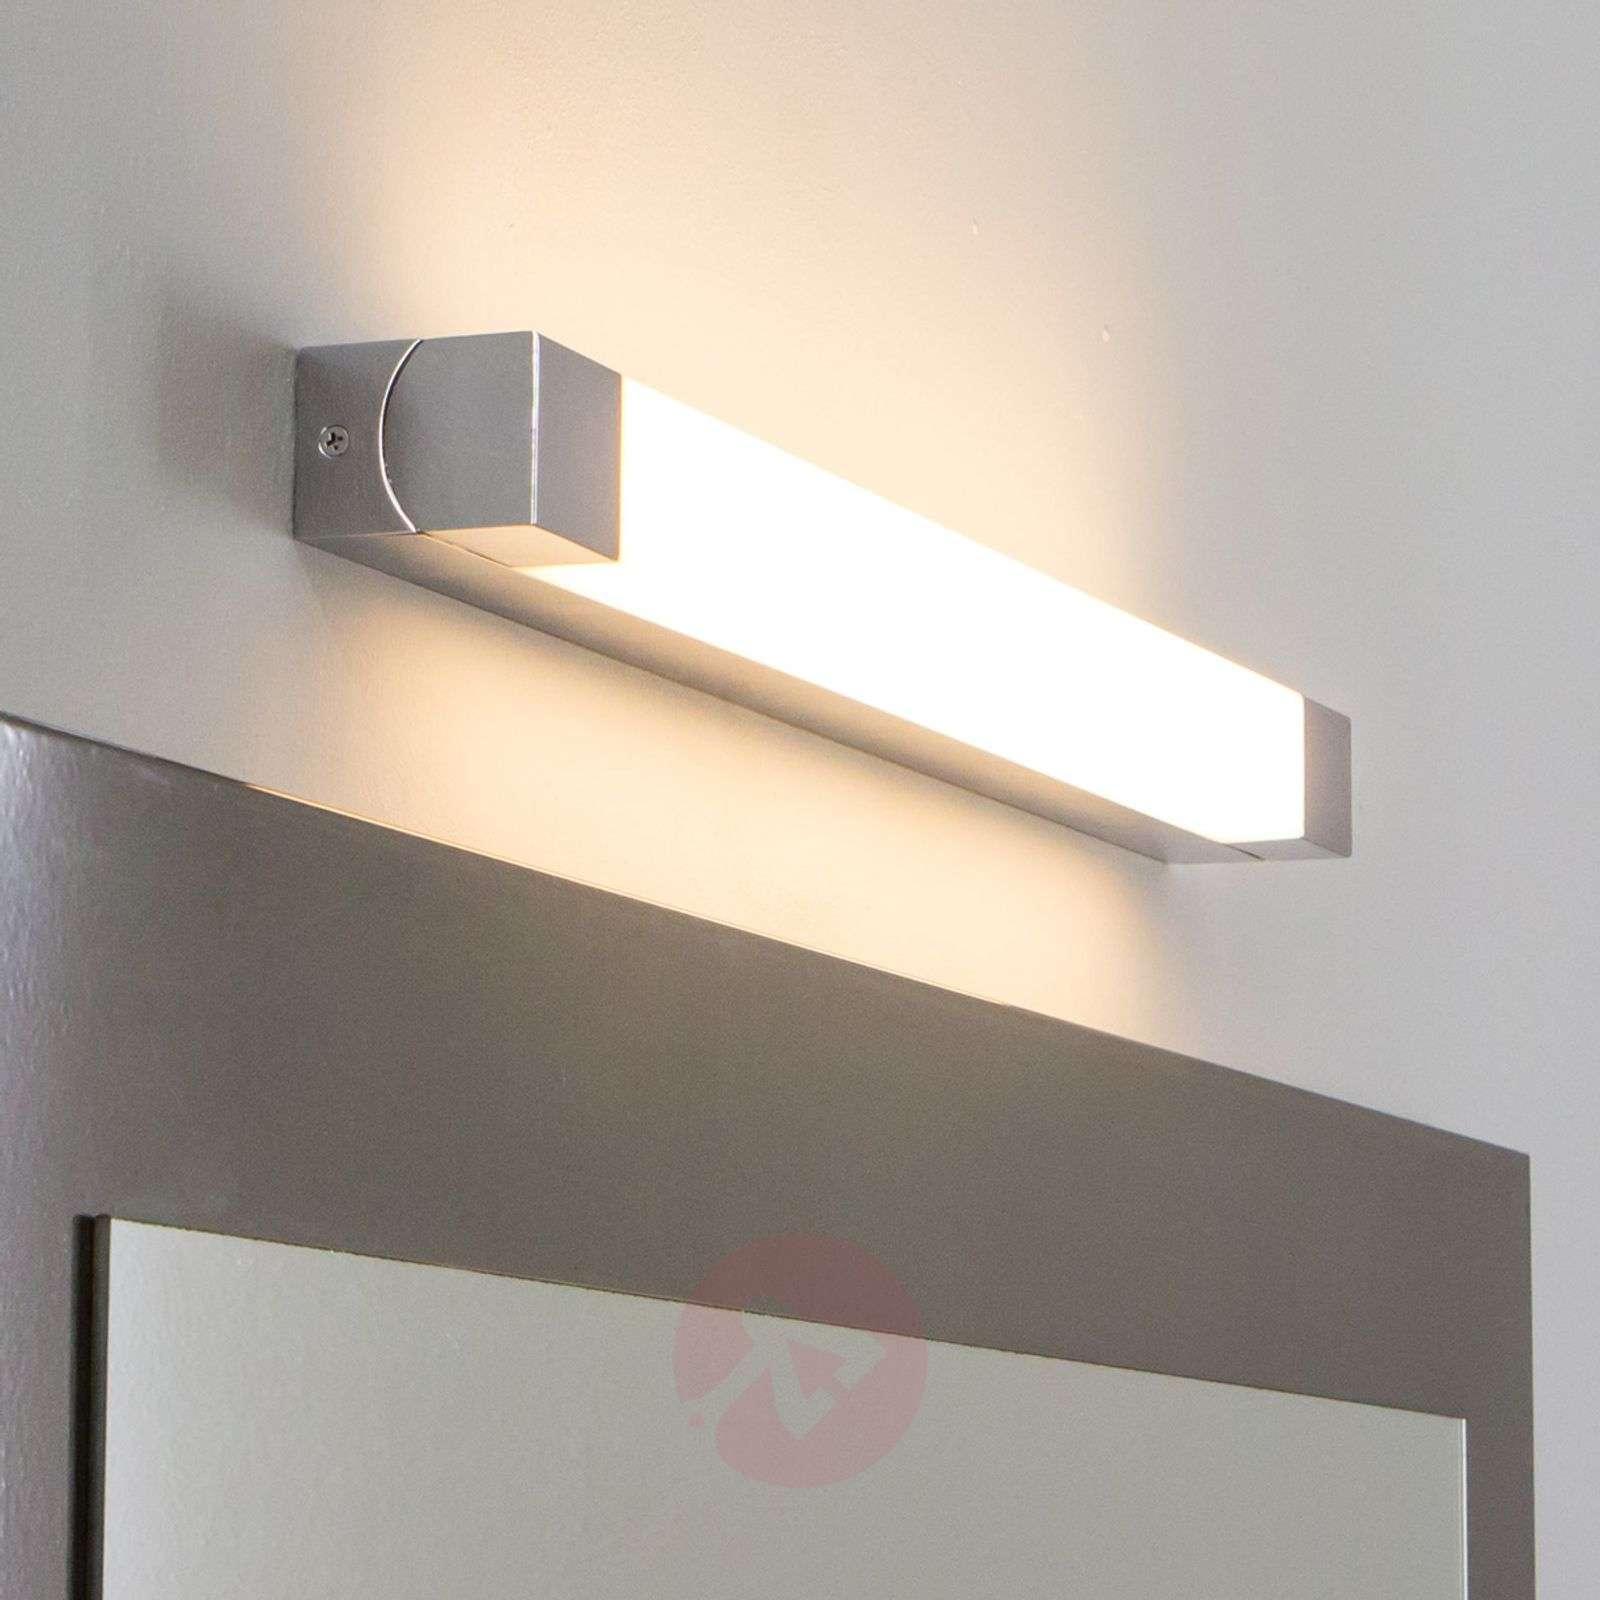 Finola LED wall lamp for the bathroom   Lights.ie